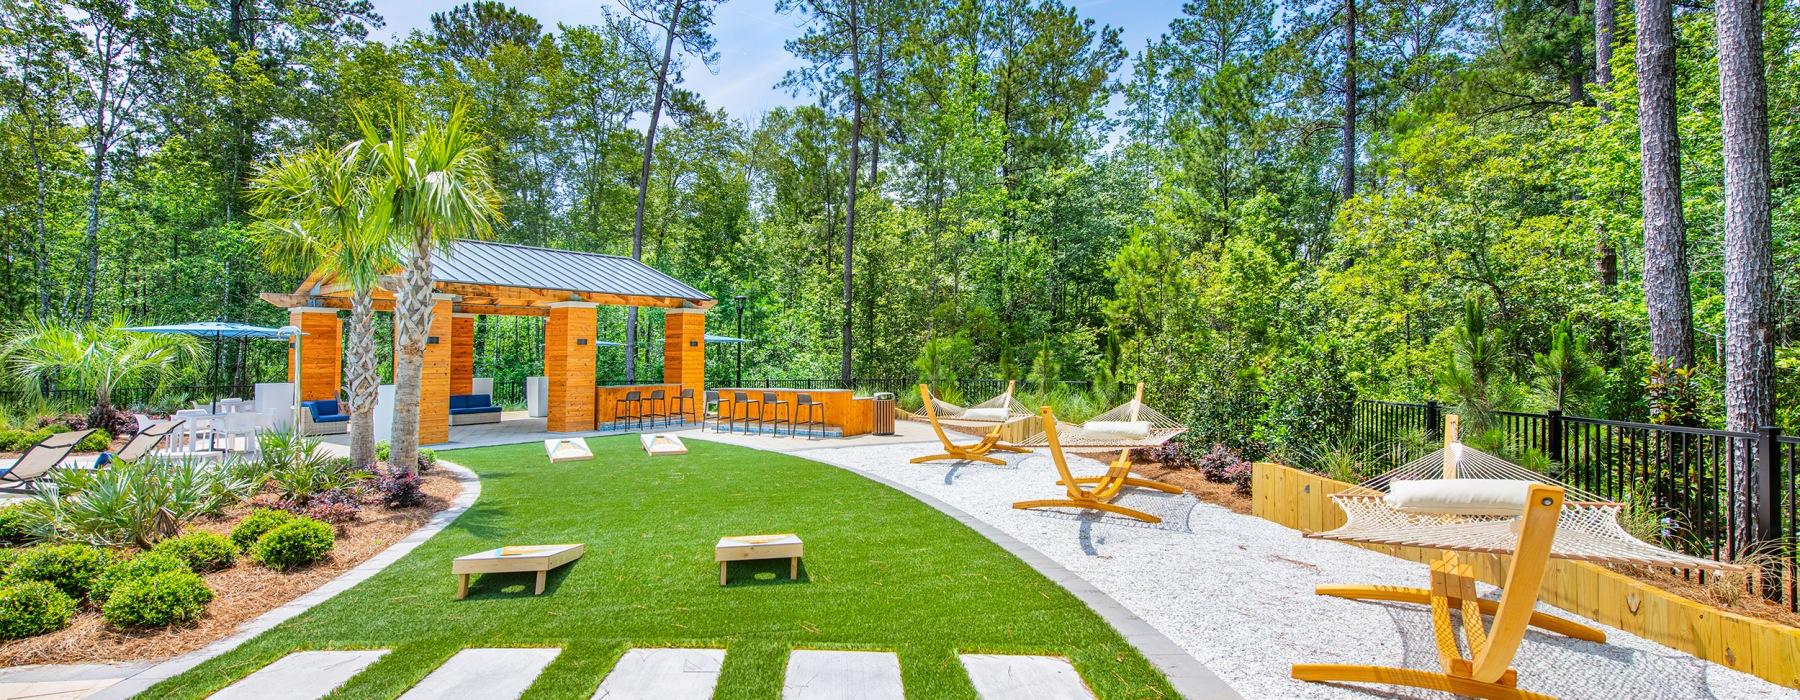 Hammock Garden + Gaming Lawn